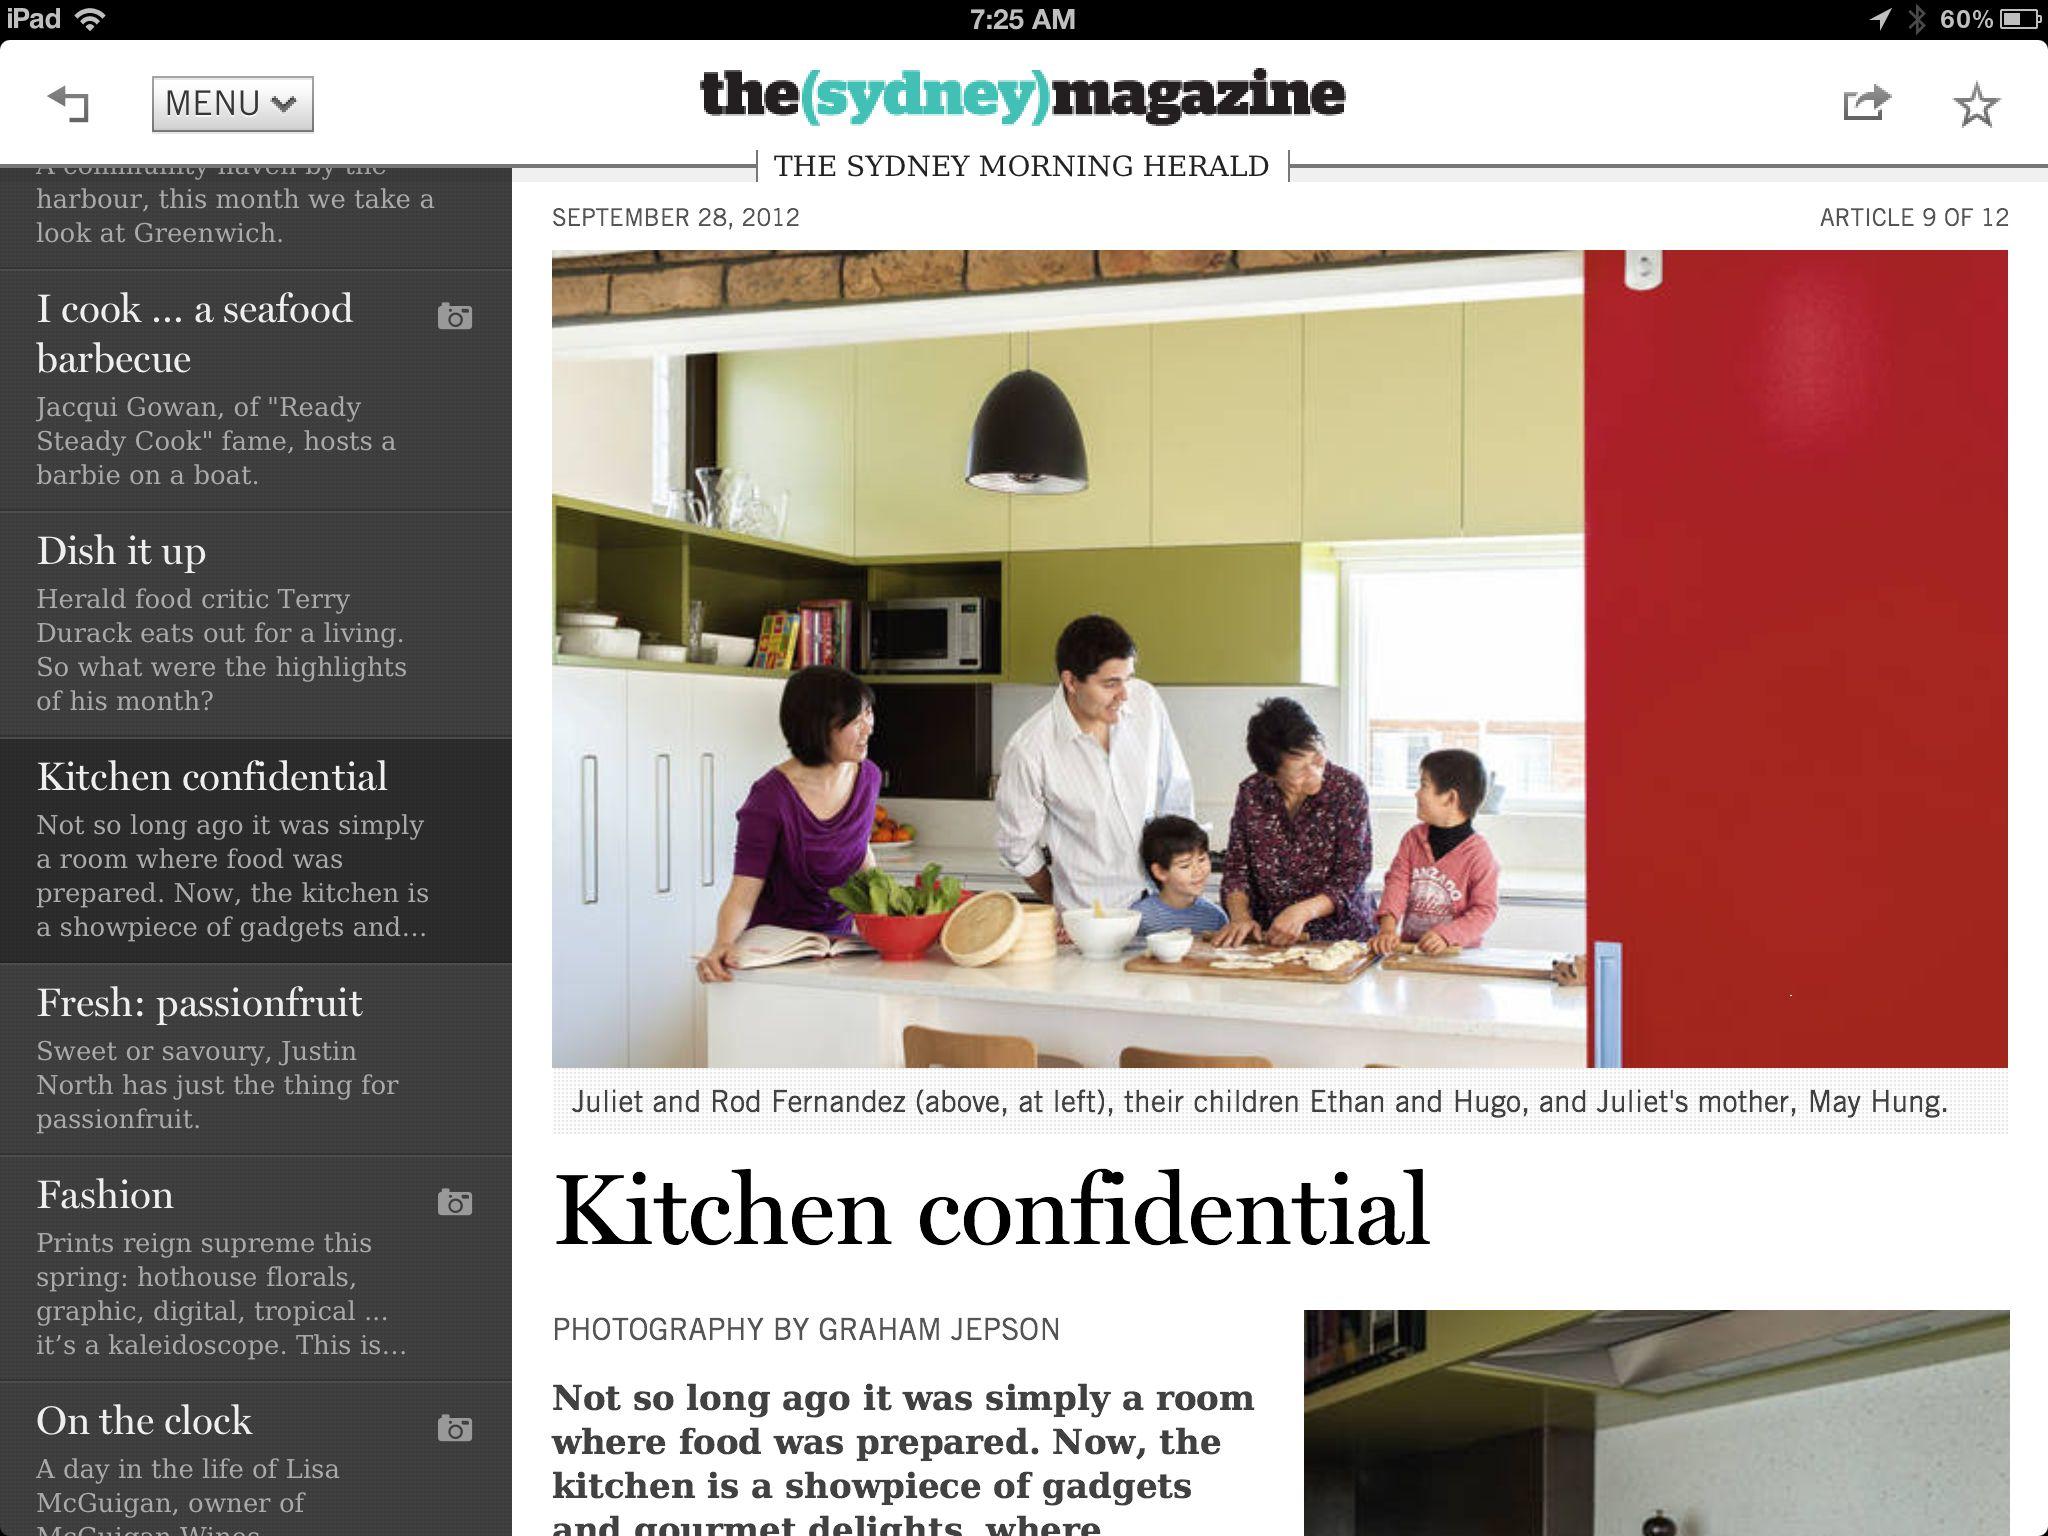 Sydney magazine Food critic, The sydney morning herald